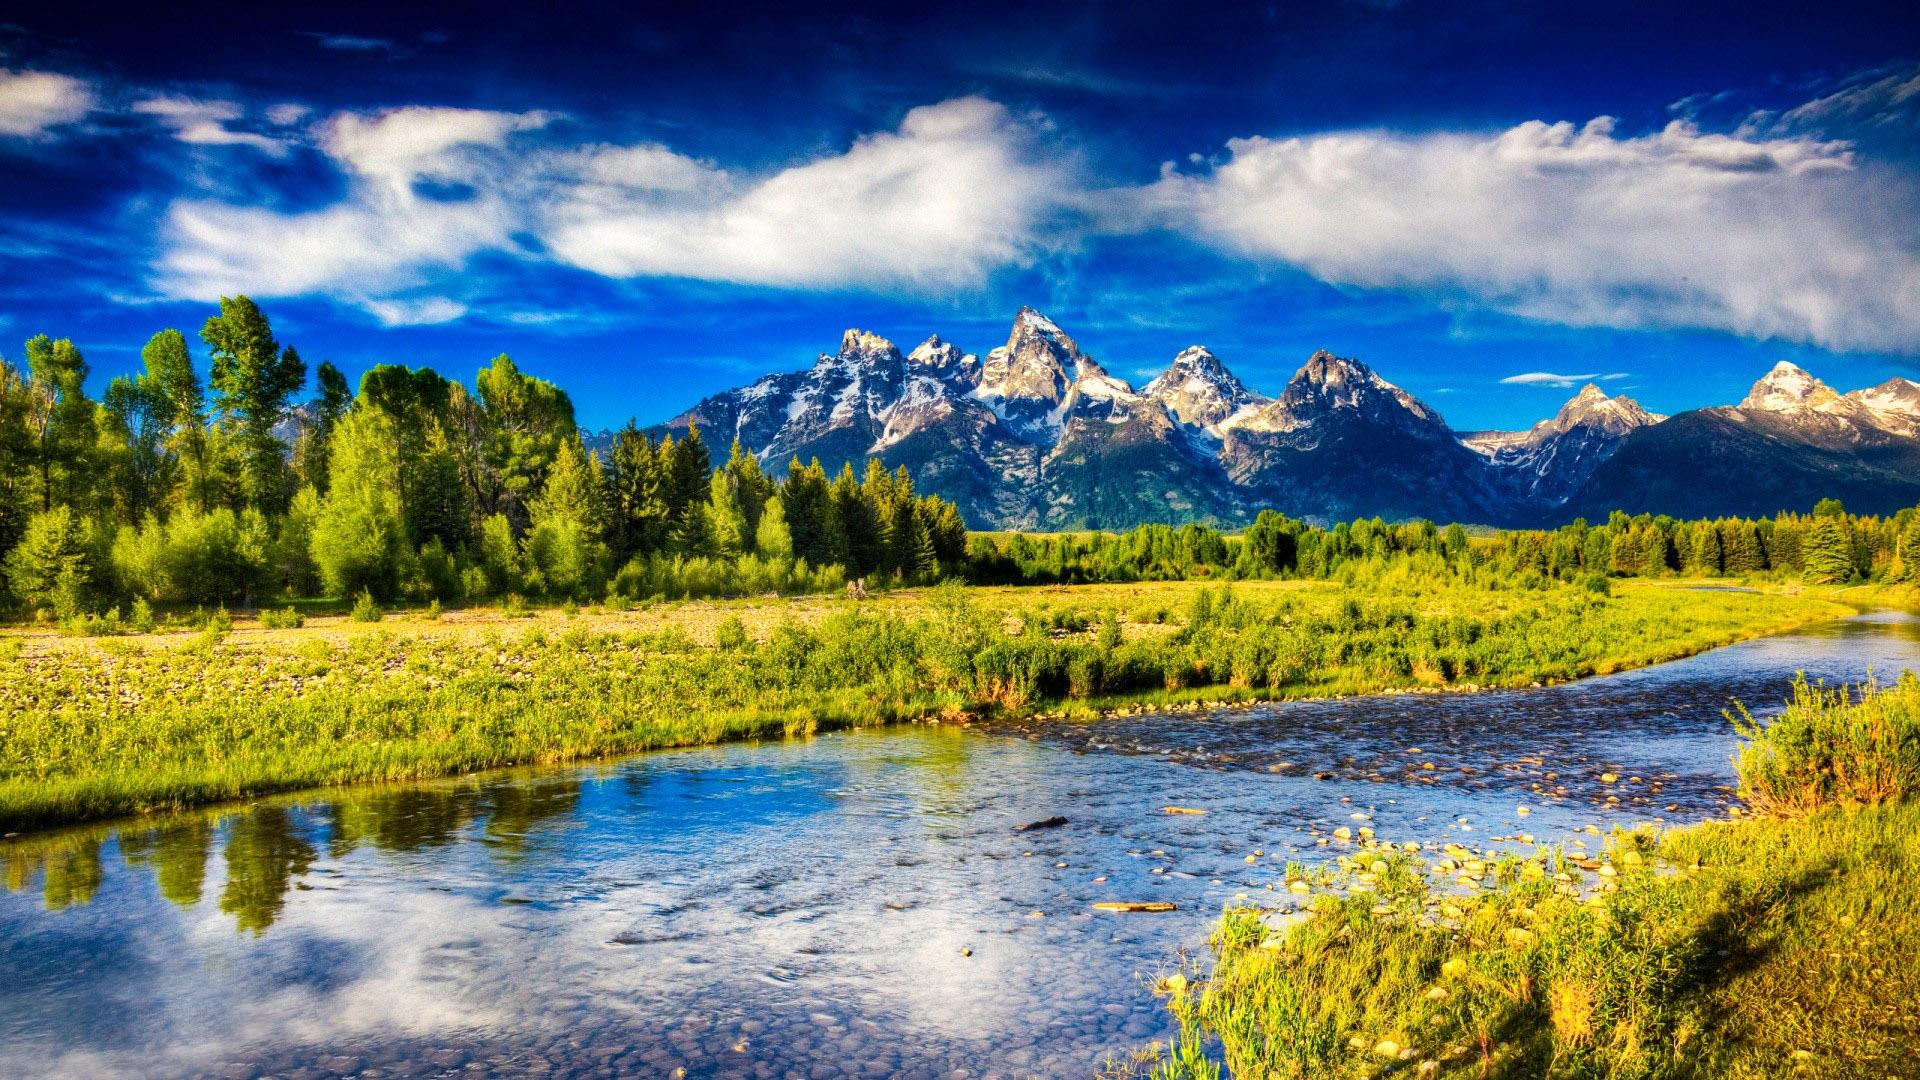 Beautiful-Nature-Scenery-wallpaper-wp5204514